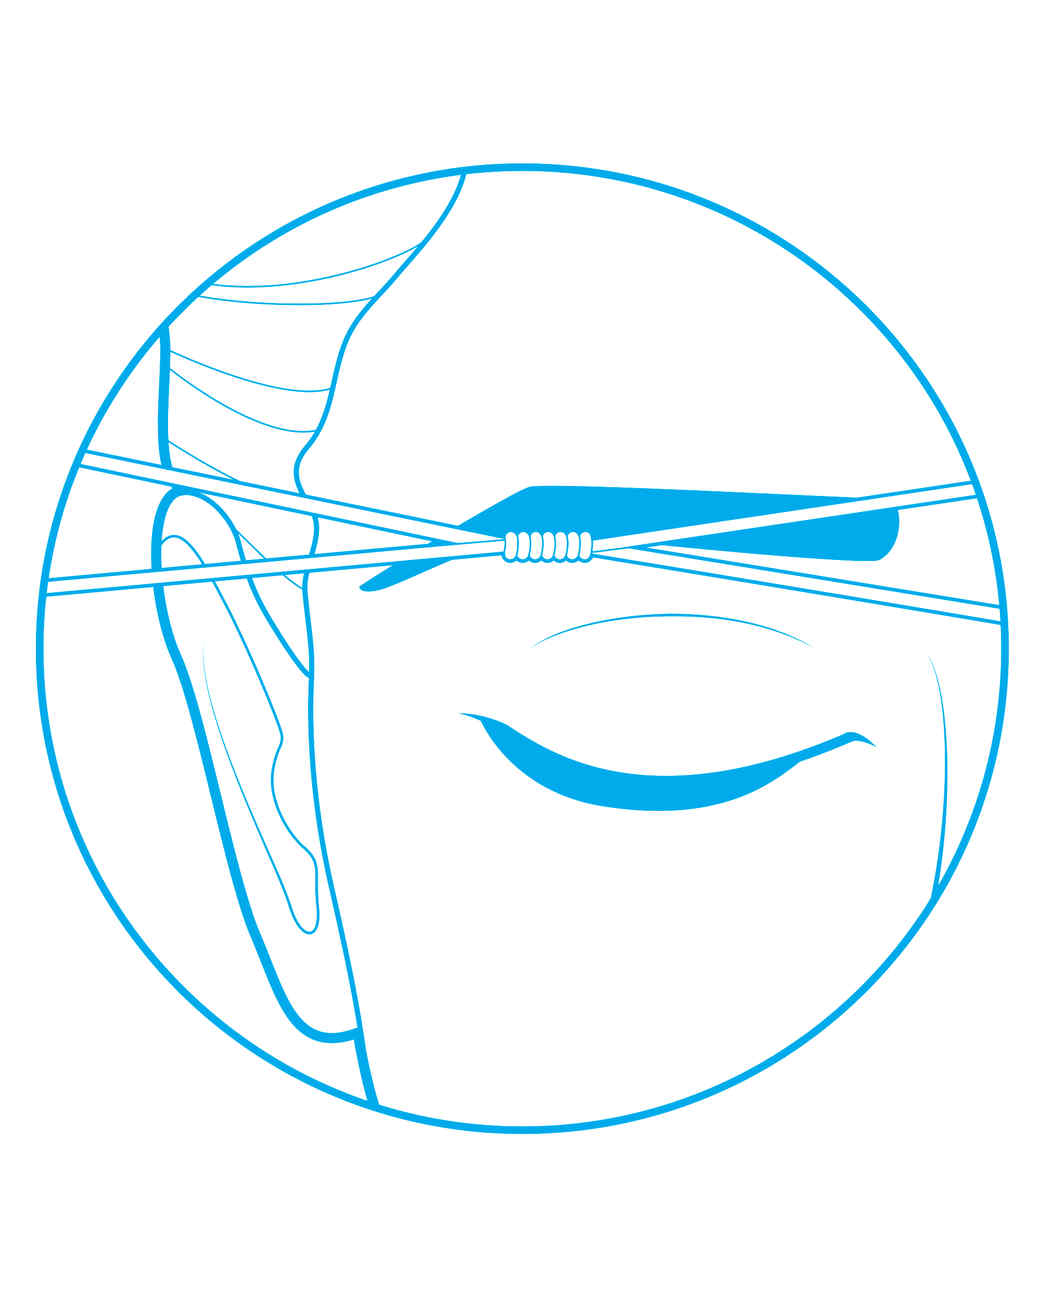 hair-removal-5-final1-i112051.jpg